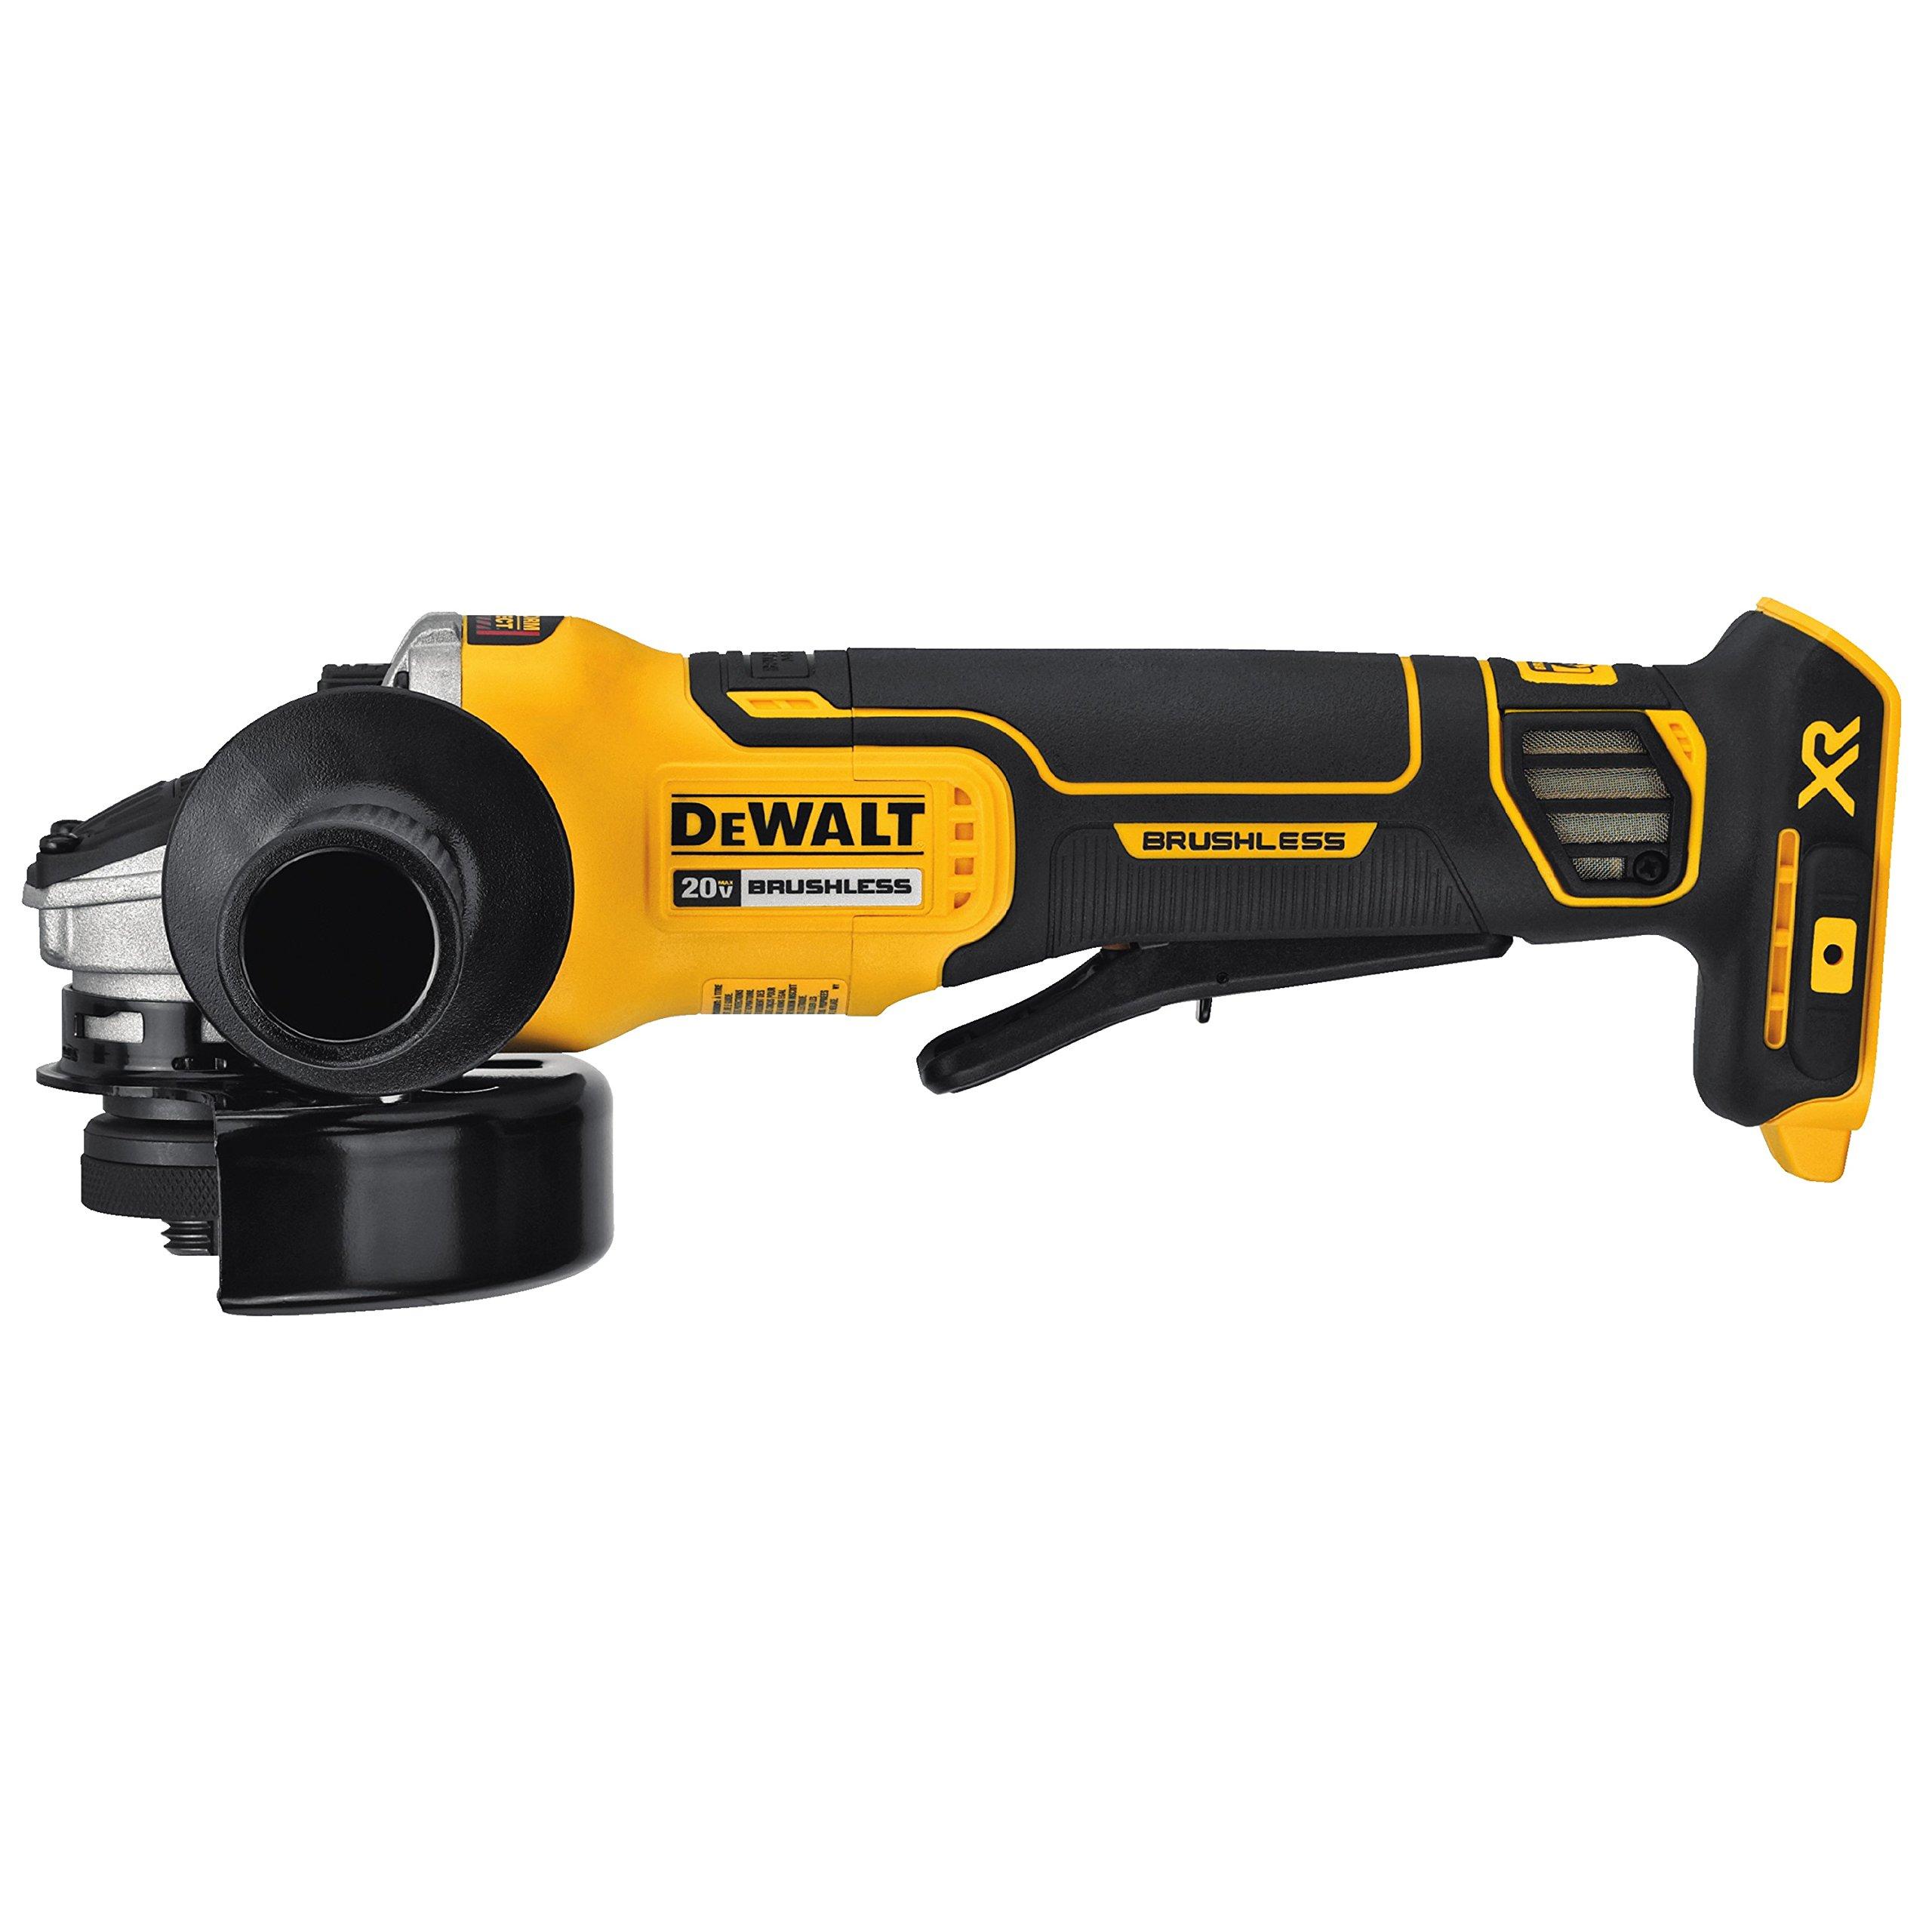 DEWALT DCG413B Brushless Tool Grinder